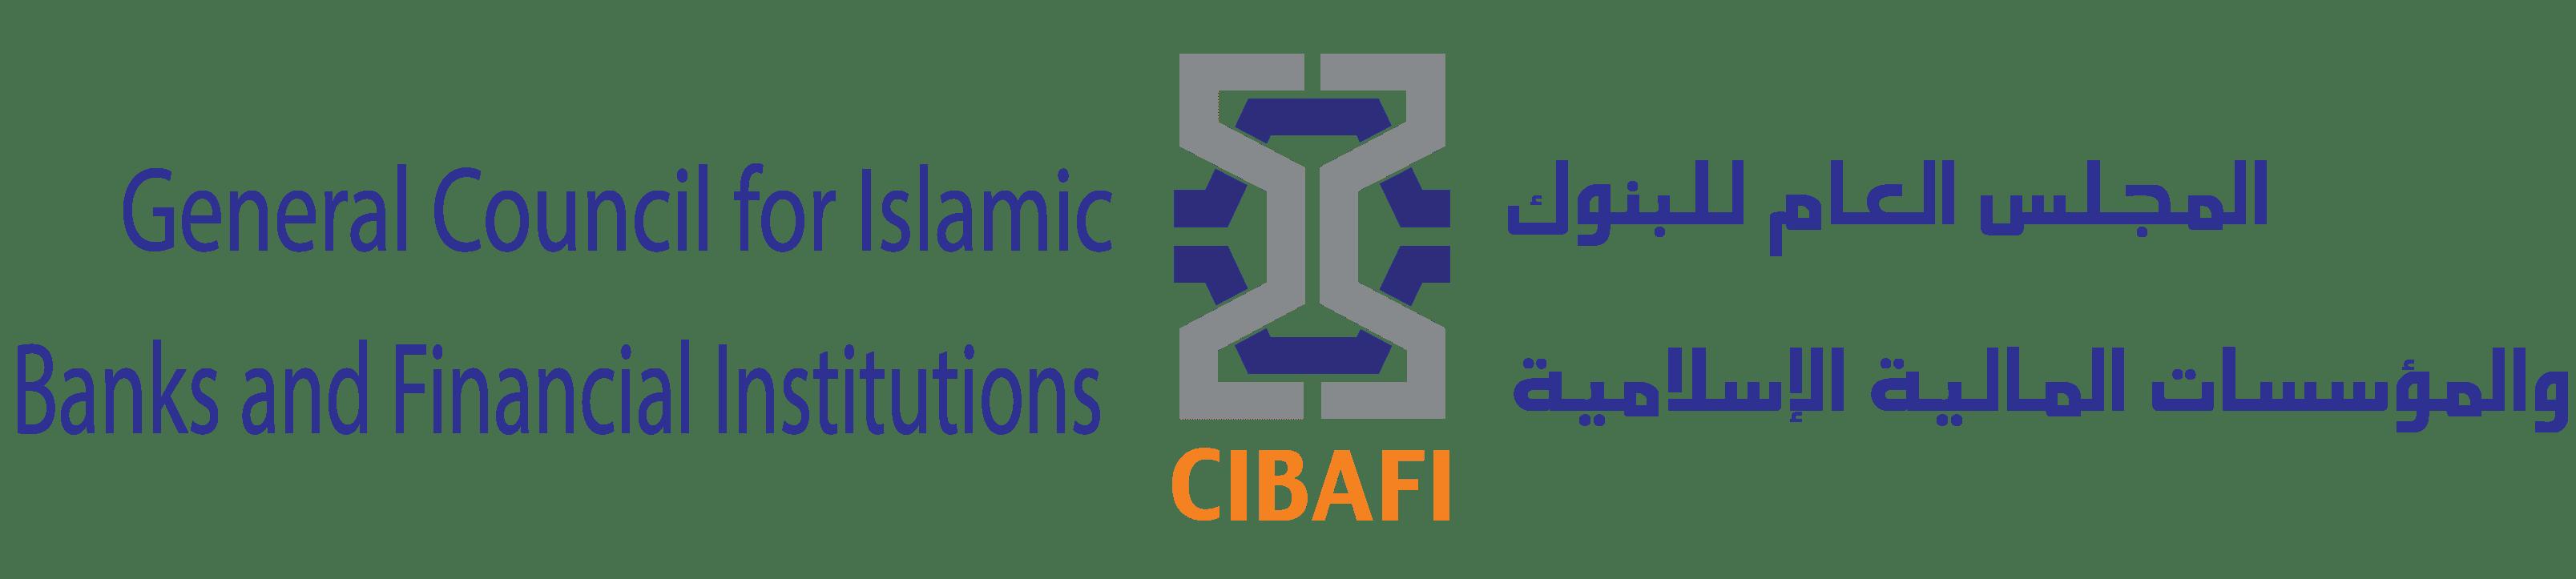 logo-cibafi.png